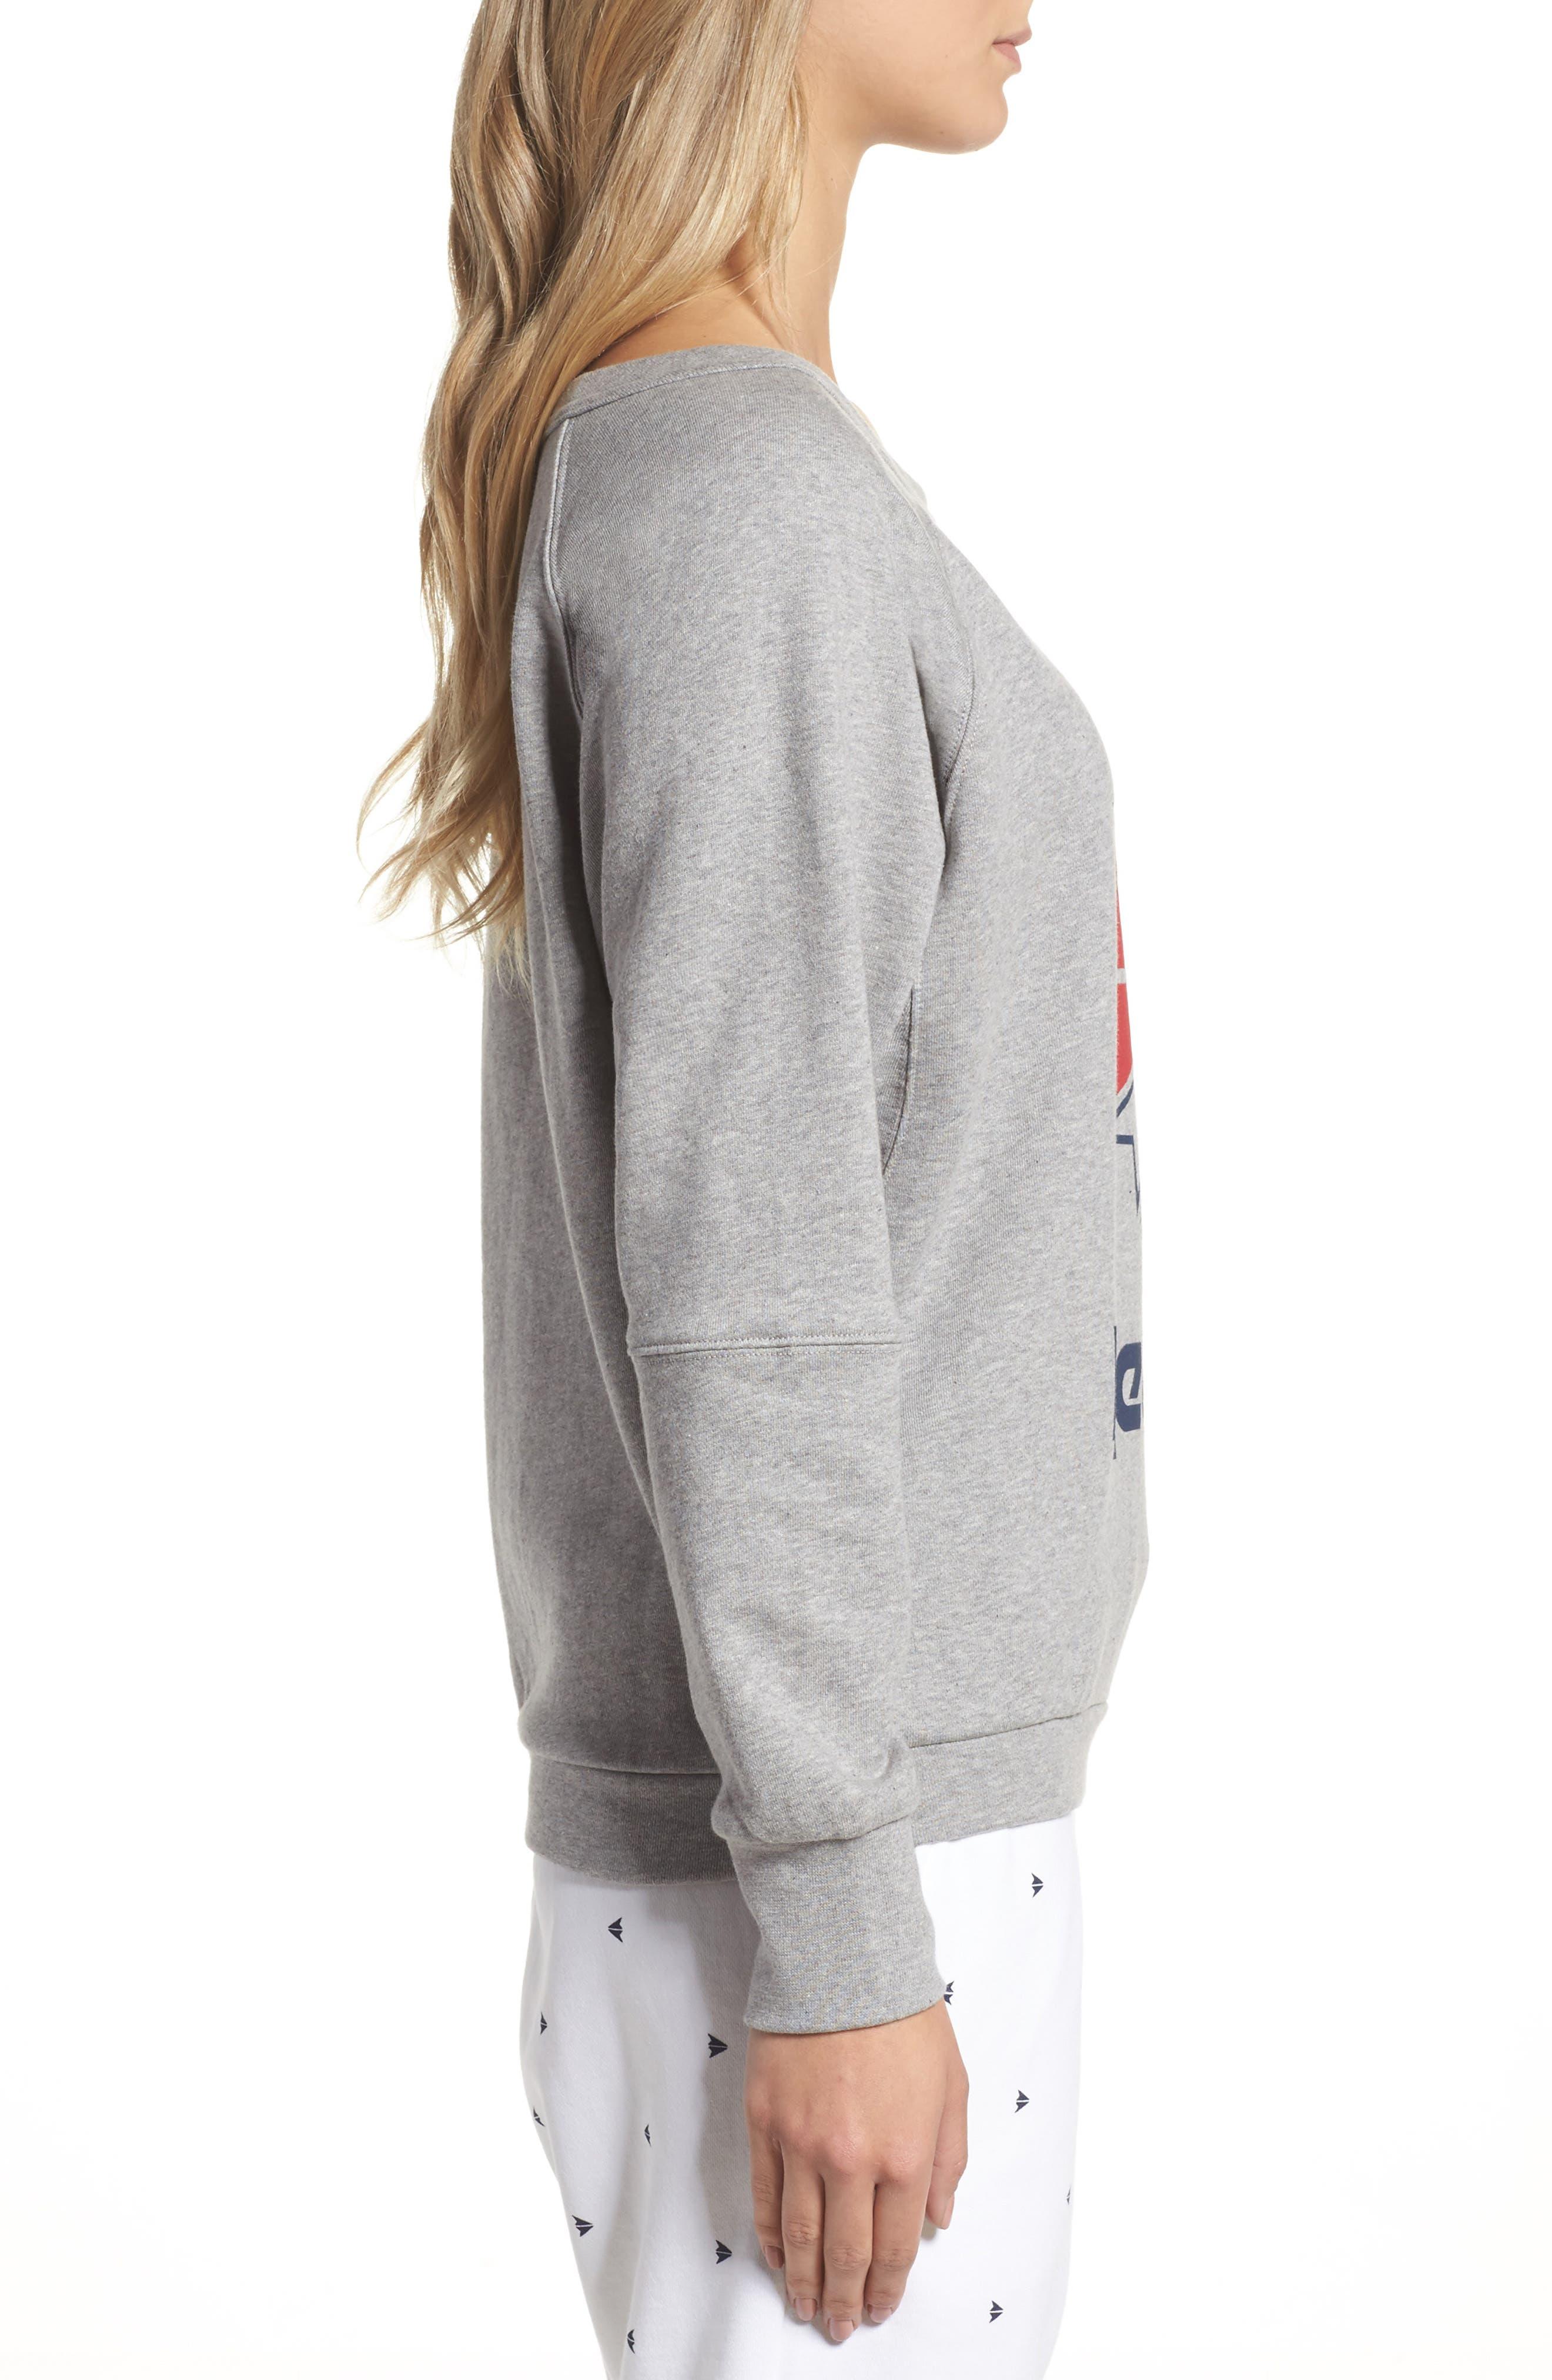 Heritage Starcrest Sweatshirt,                             Alternate thumbnail 3, color,                             Medium Heather Grey